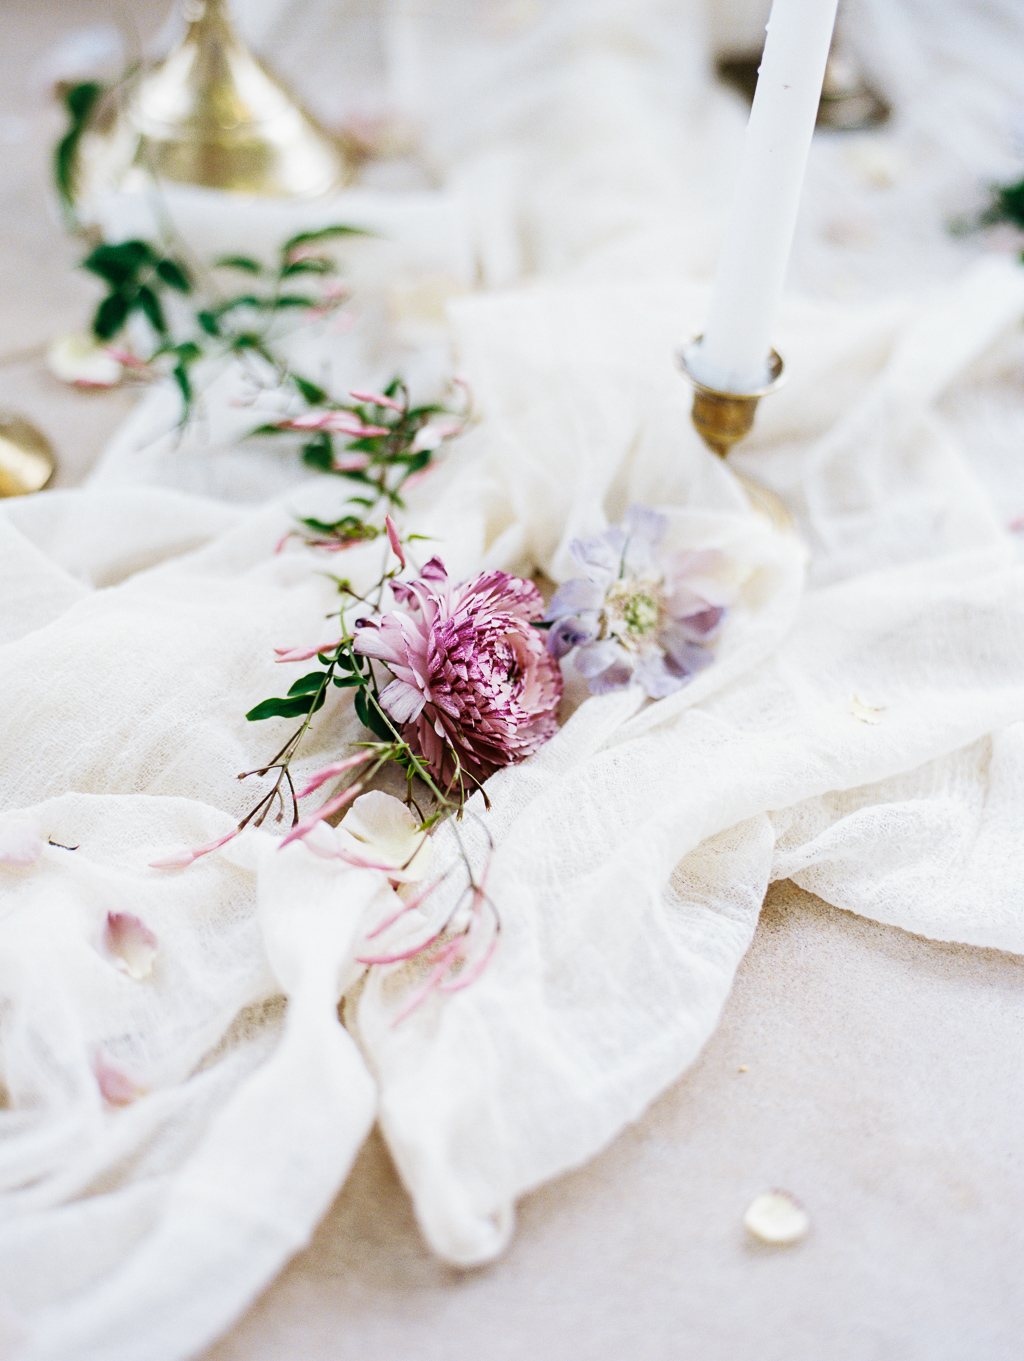 dc-wedding-florist-love-blooms